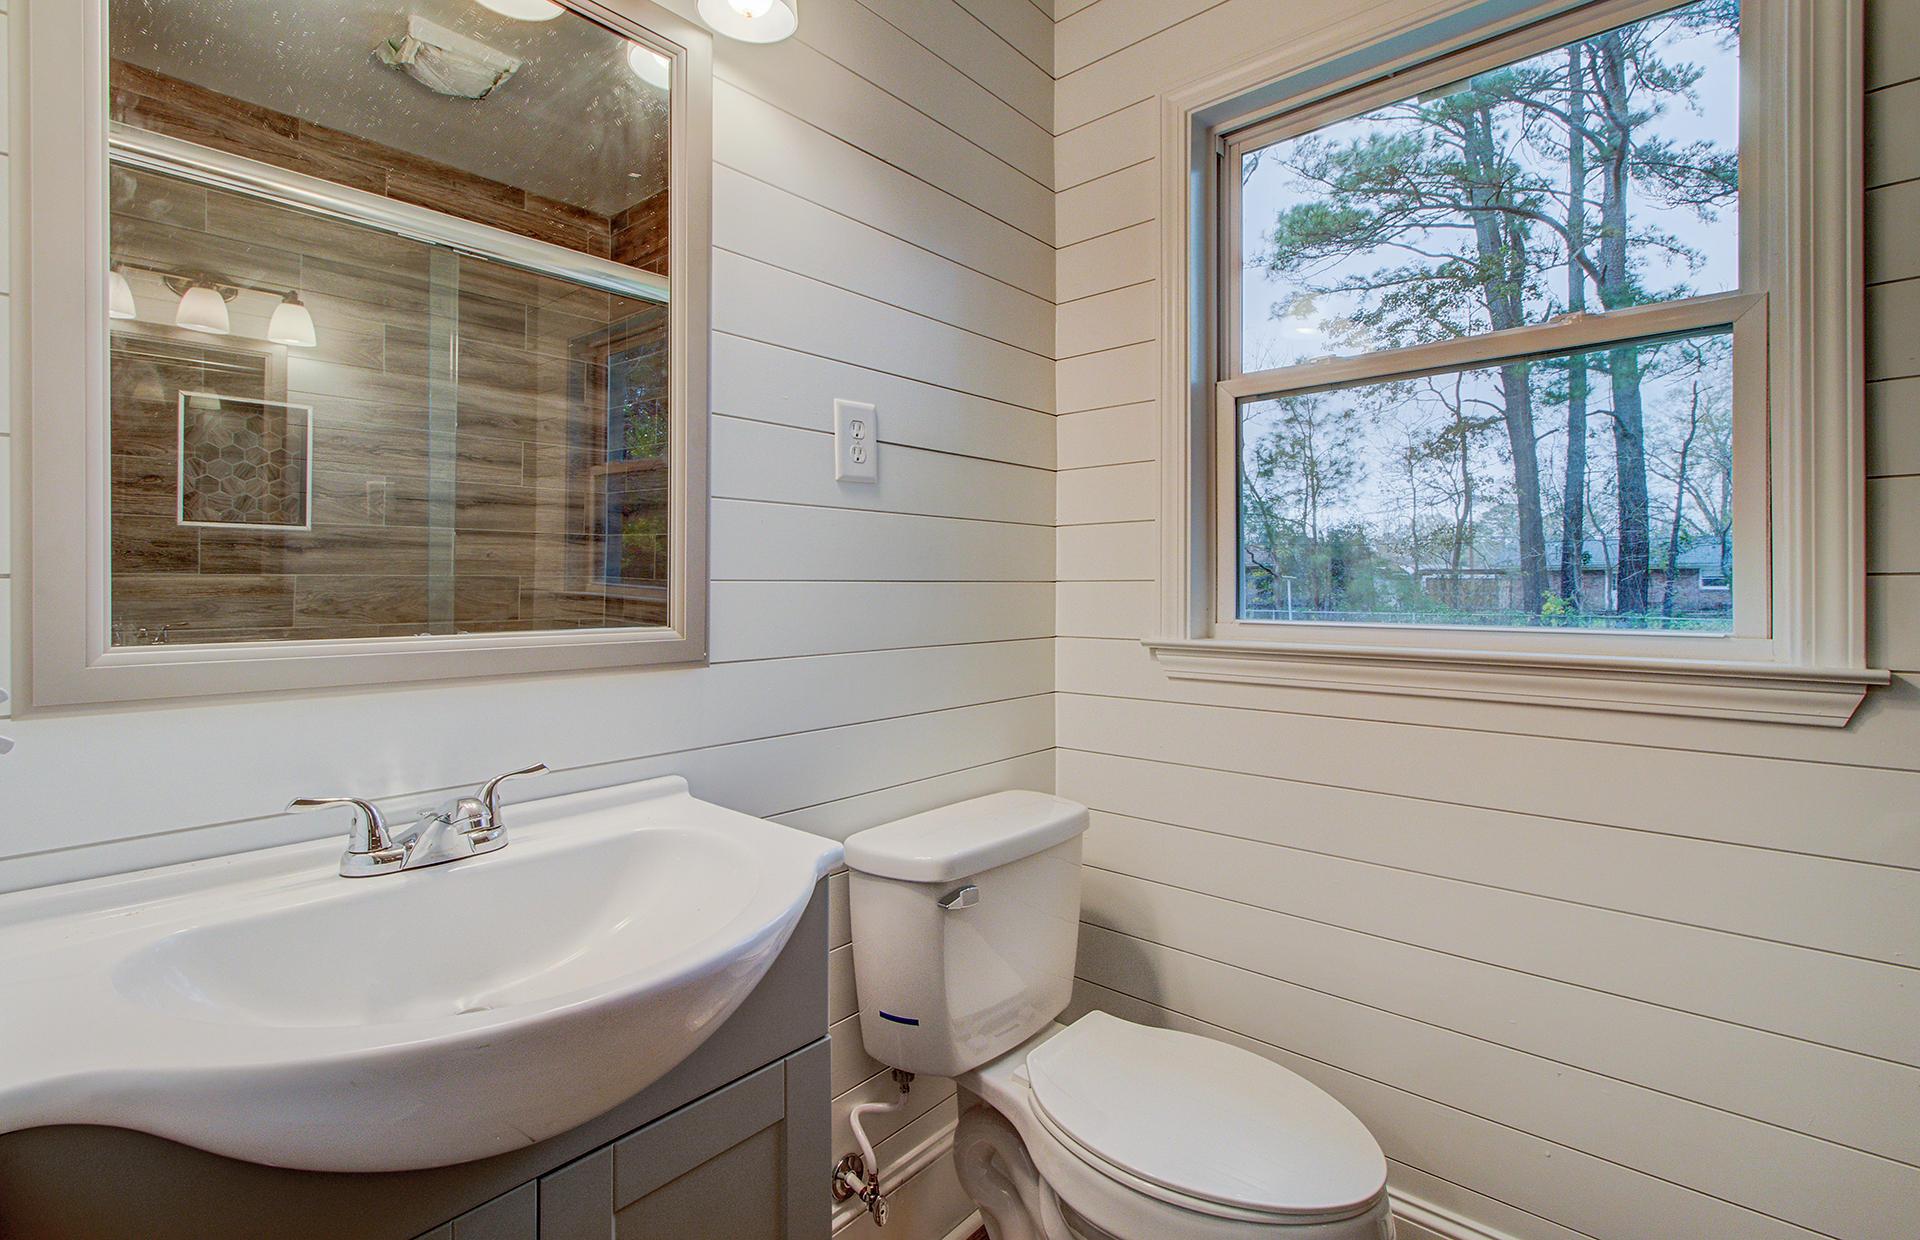 Sedgefield Section I Homes For Sale - 30 Aldene, Goose Creek, SC - 10